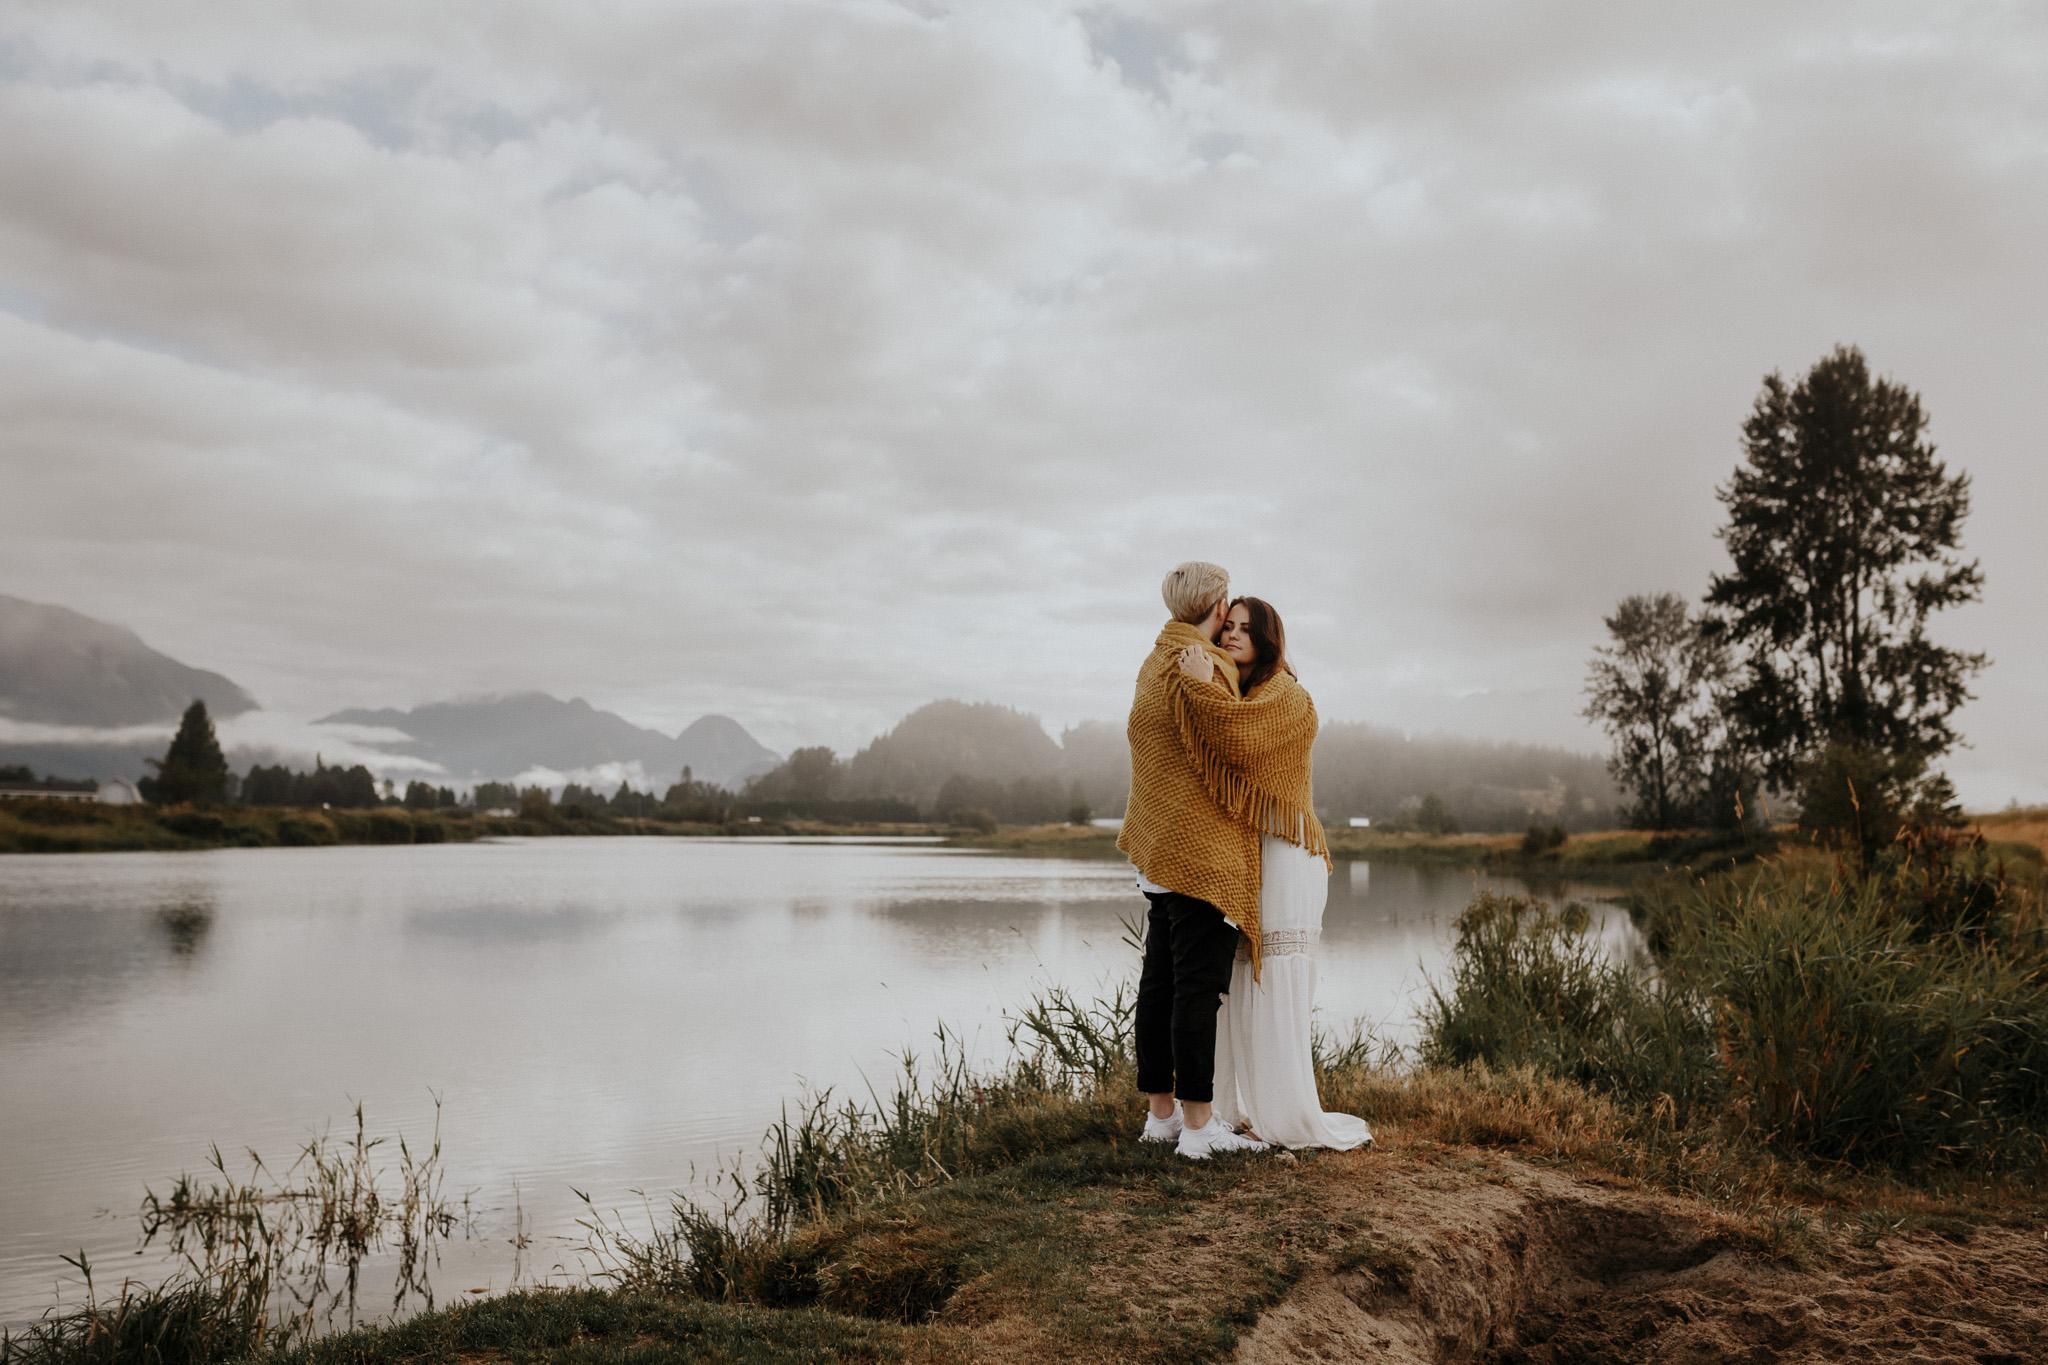 vancouver wedding photographer - lifestyle engagement session-17.jpg